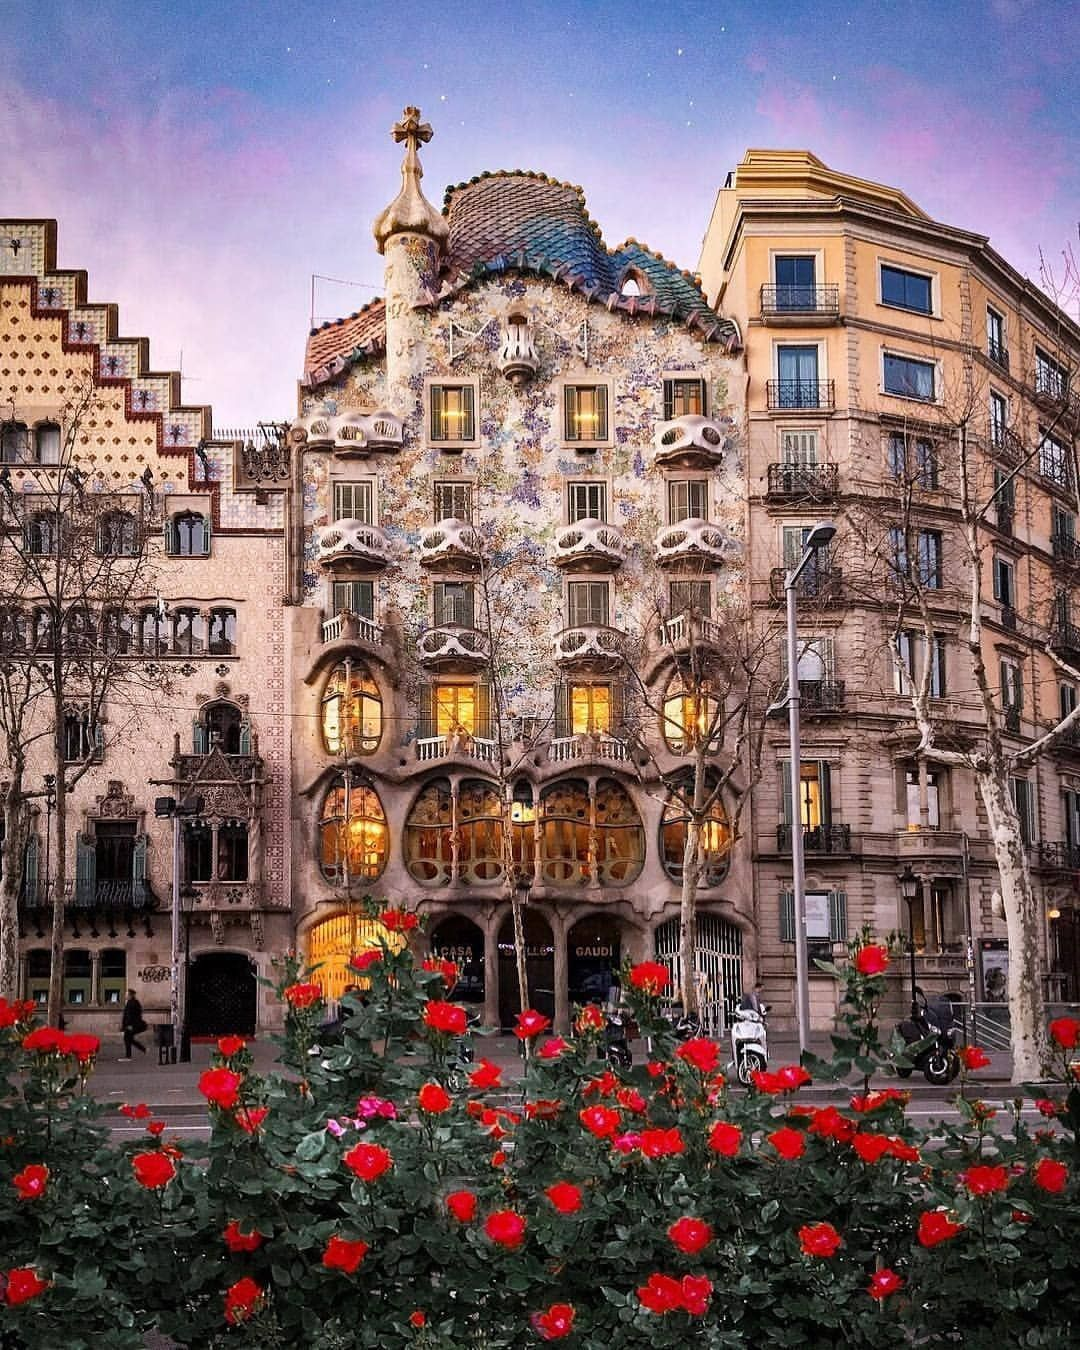 Casa Batllo Barcelona Spaina Beautifulplaces Places Placestovisit Spain Spaintraveling Travel Traveldestinations Spain Travel Spain Places To Visit